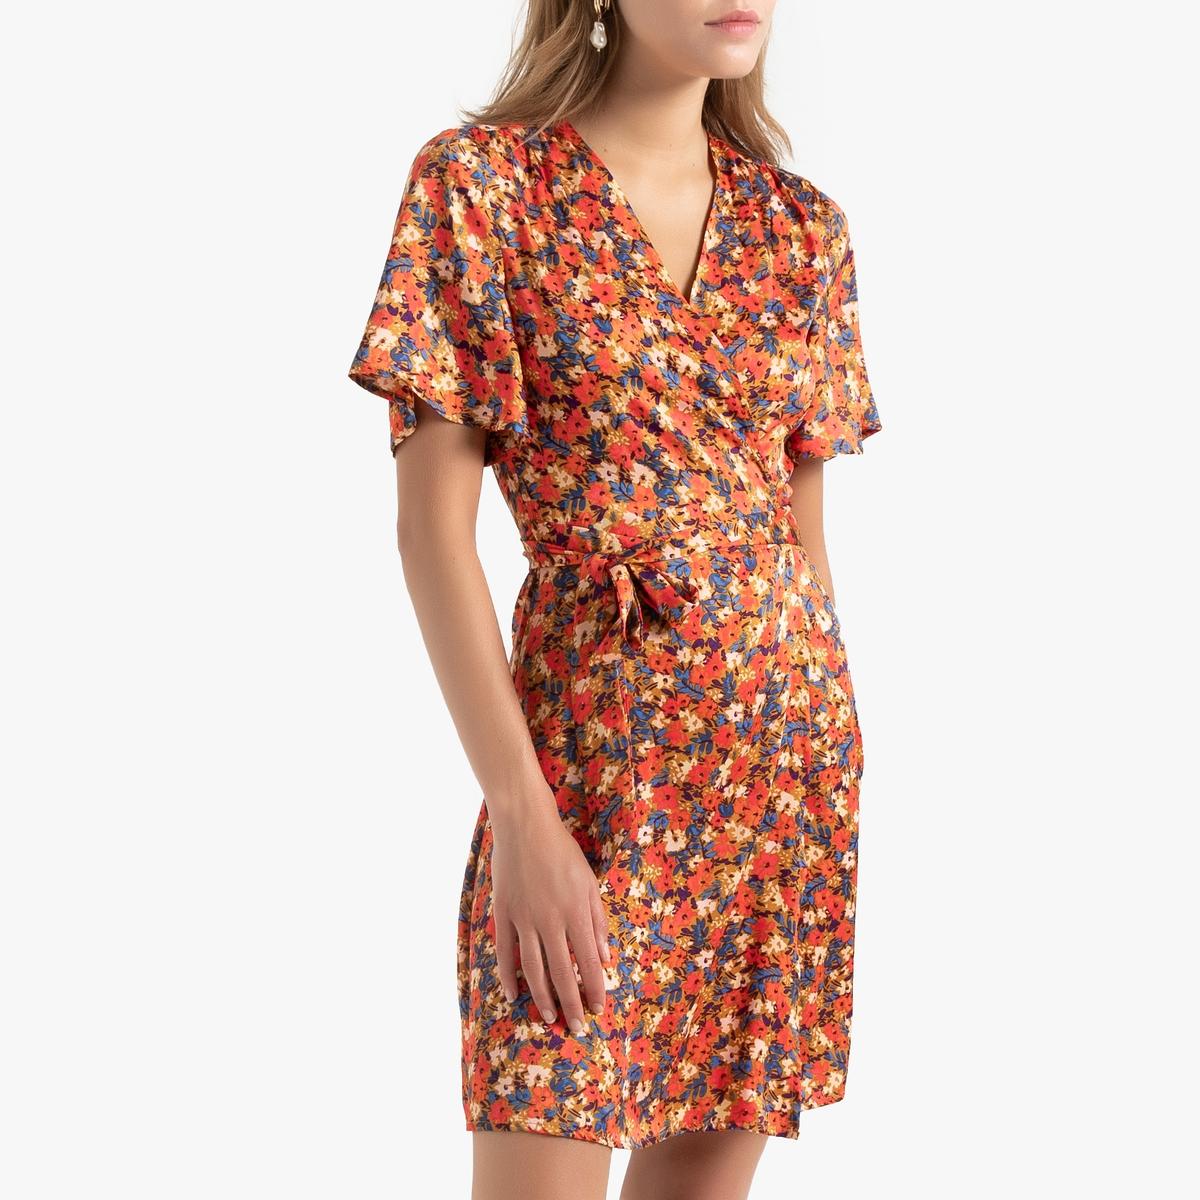 Платье La Redoute Короткое с короткими рукавами 34 (FR) - 40 (RUS) разноцветный бушлат la redoute с рисунком клетка 34 fr 40 rus синий